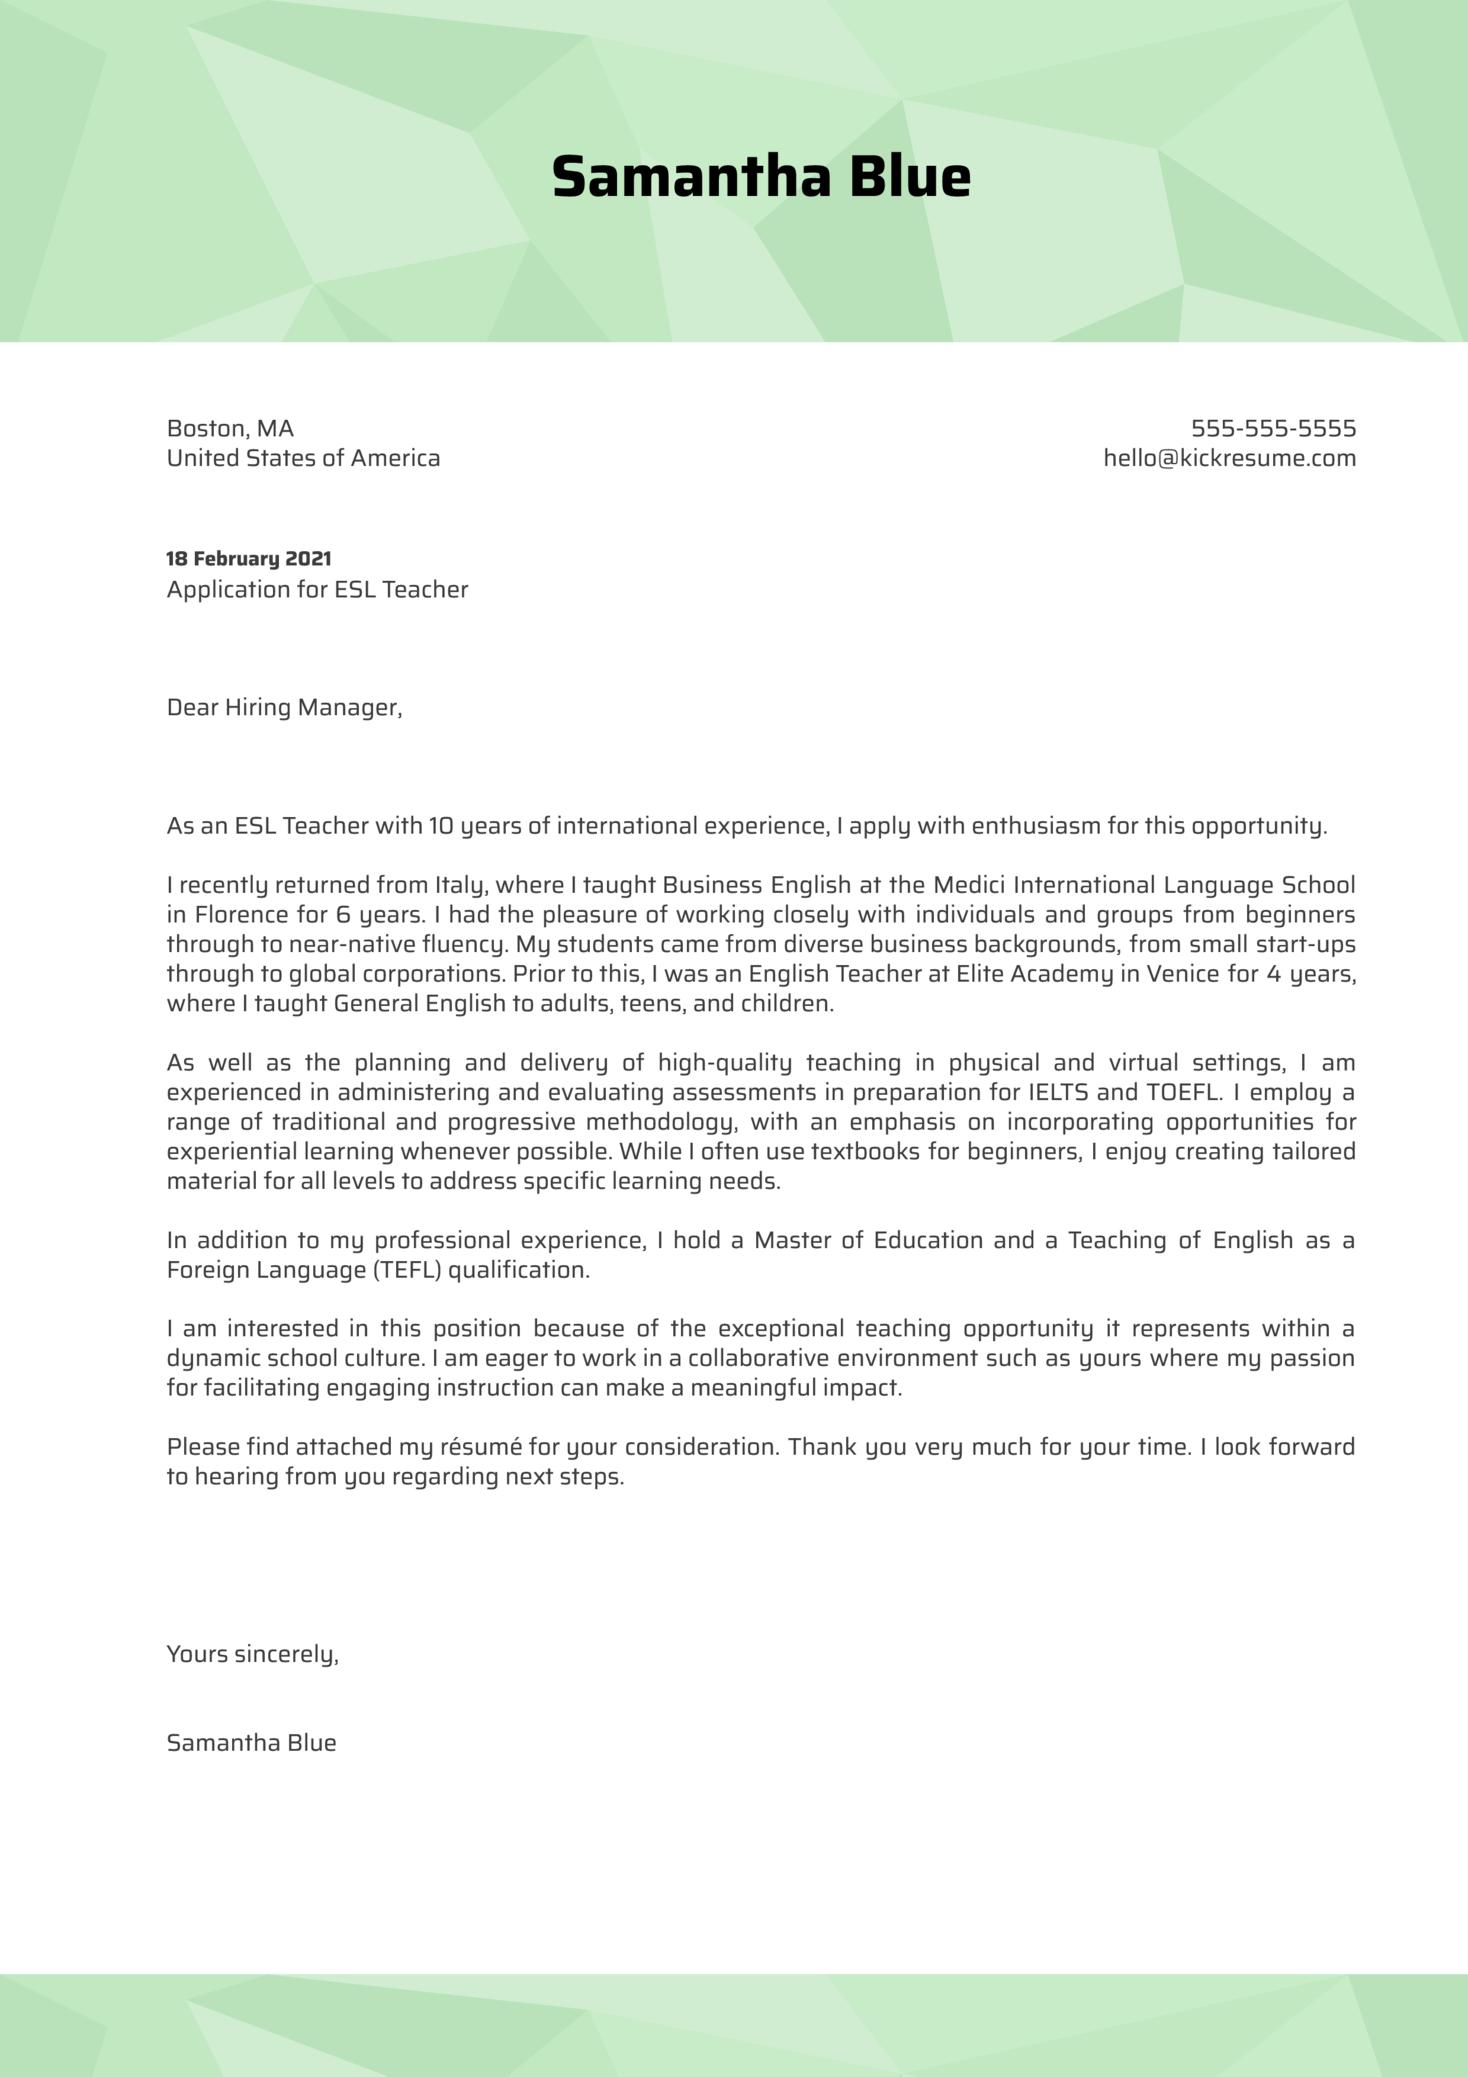 ESL Teacher Cover Letter Template (parte 1)